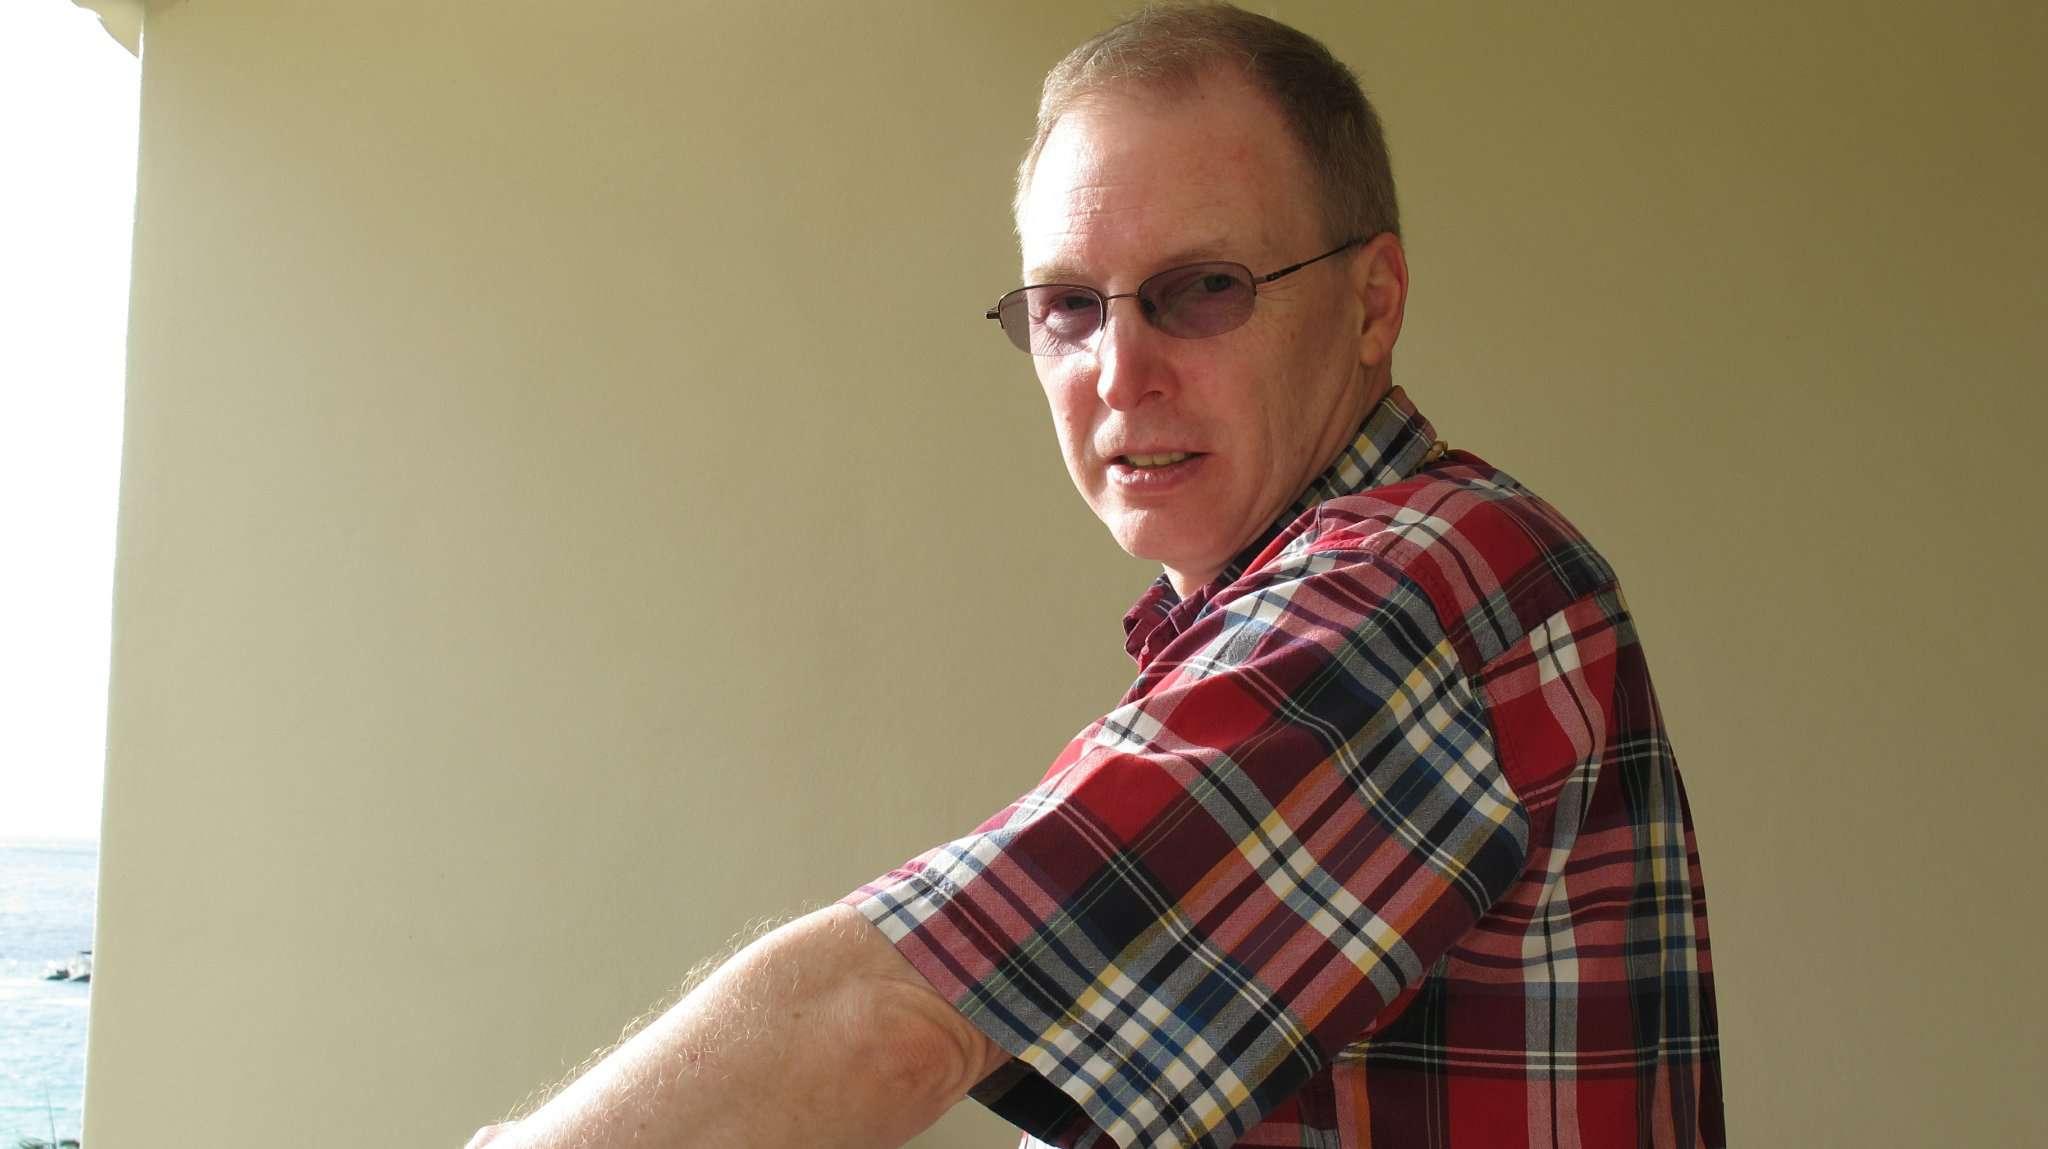 David Schroeder's Profile Picture